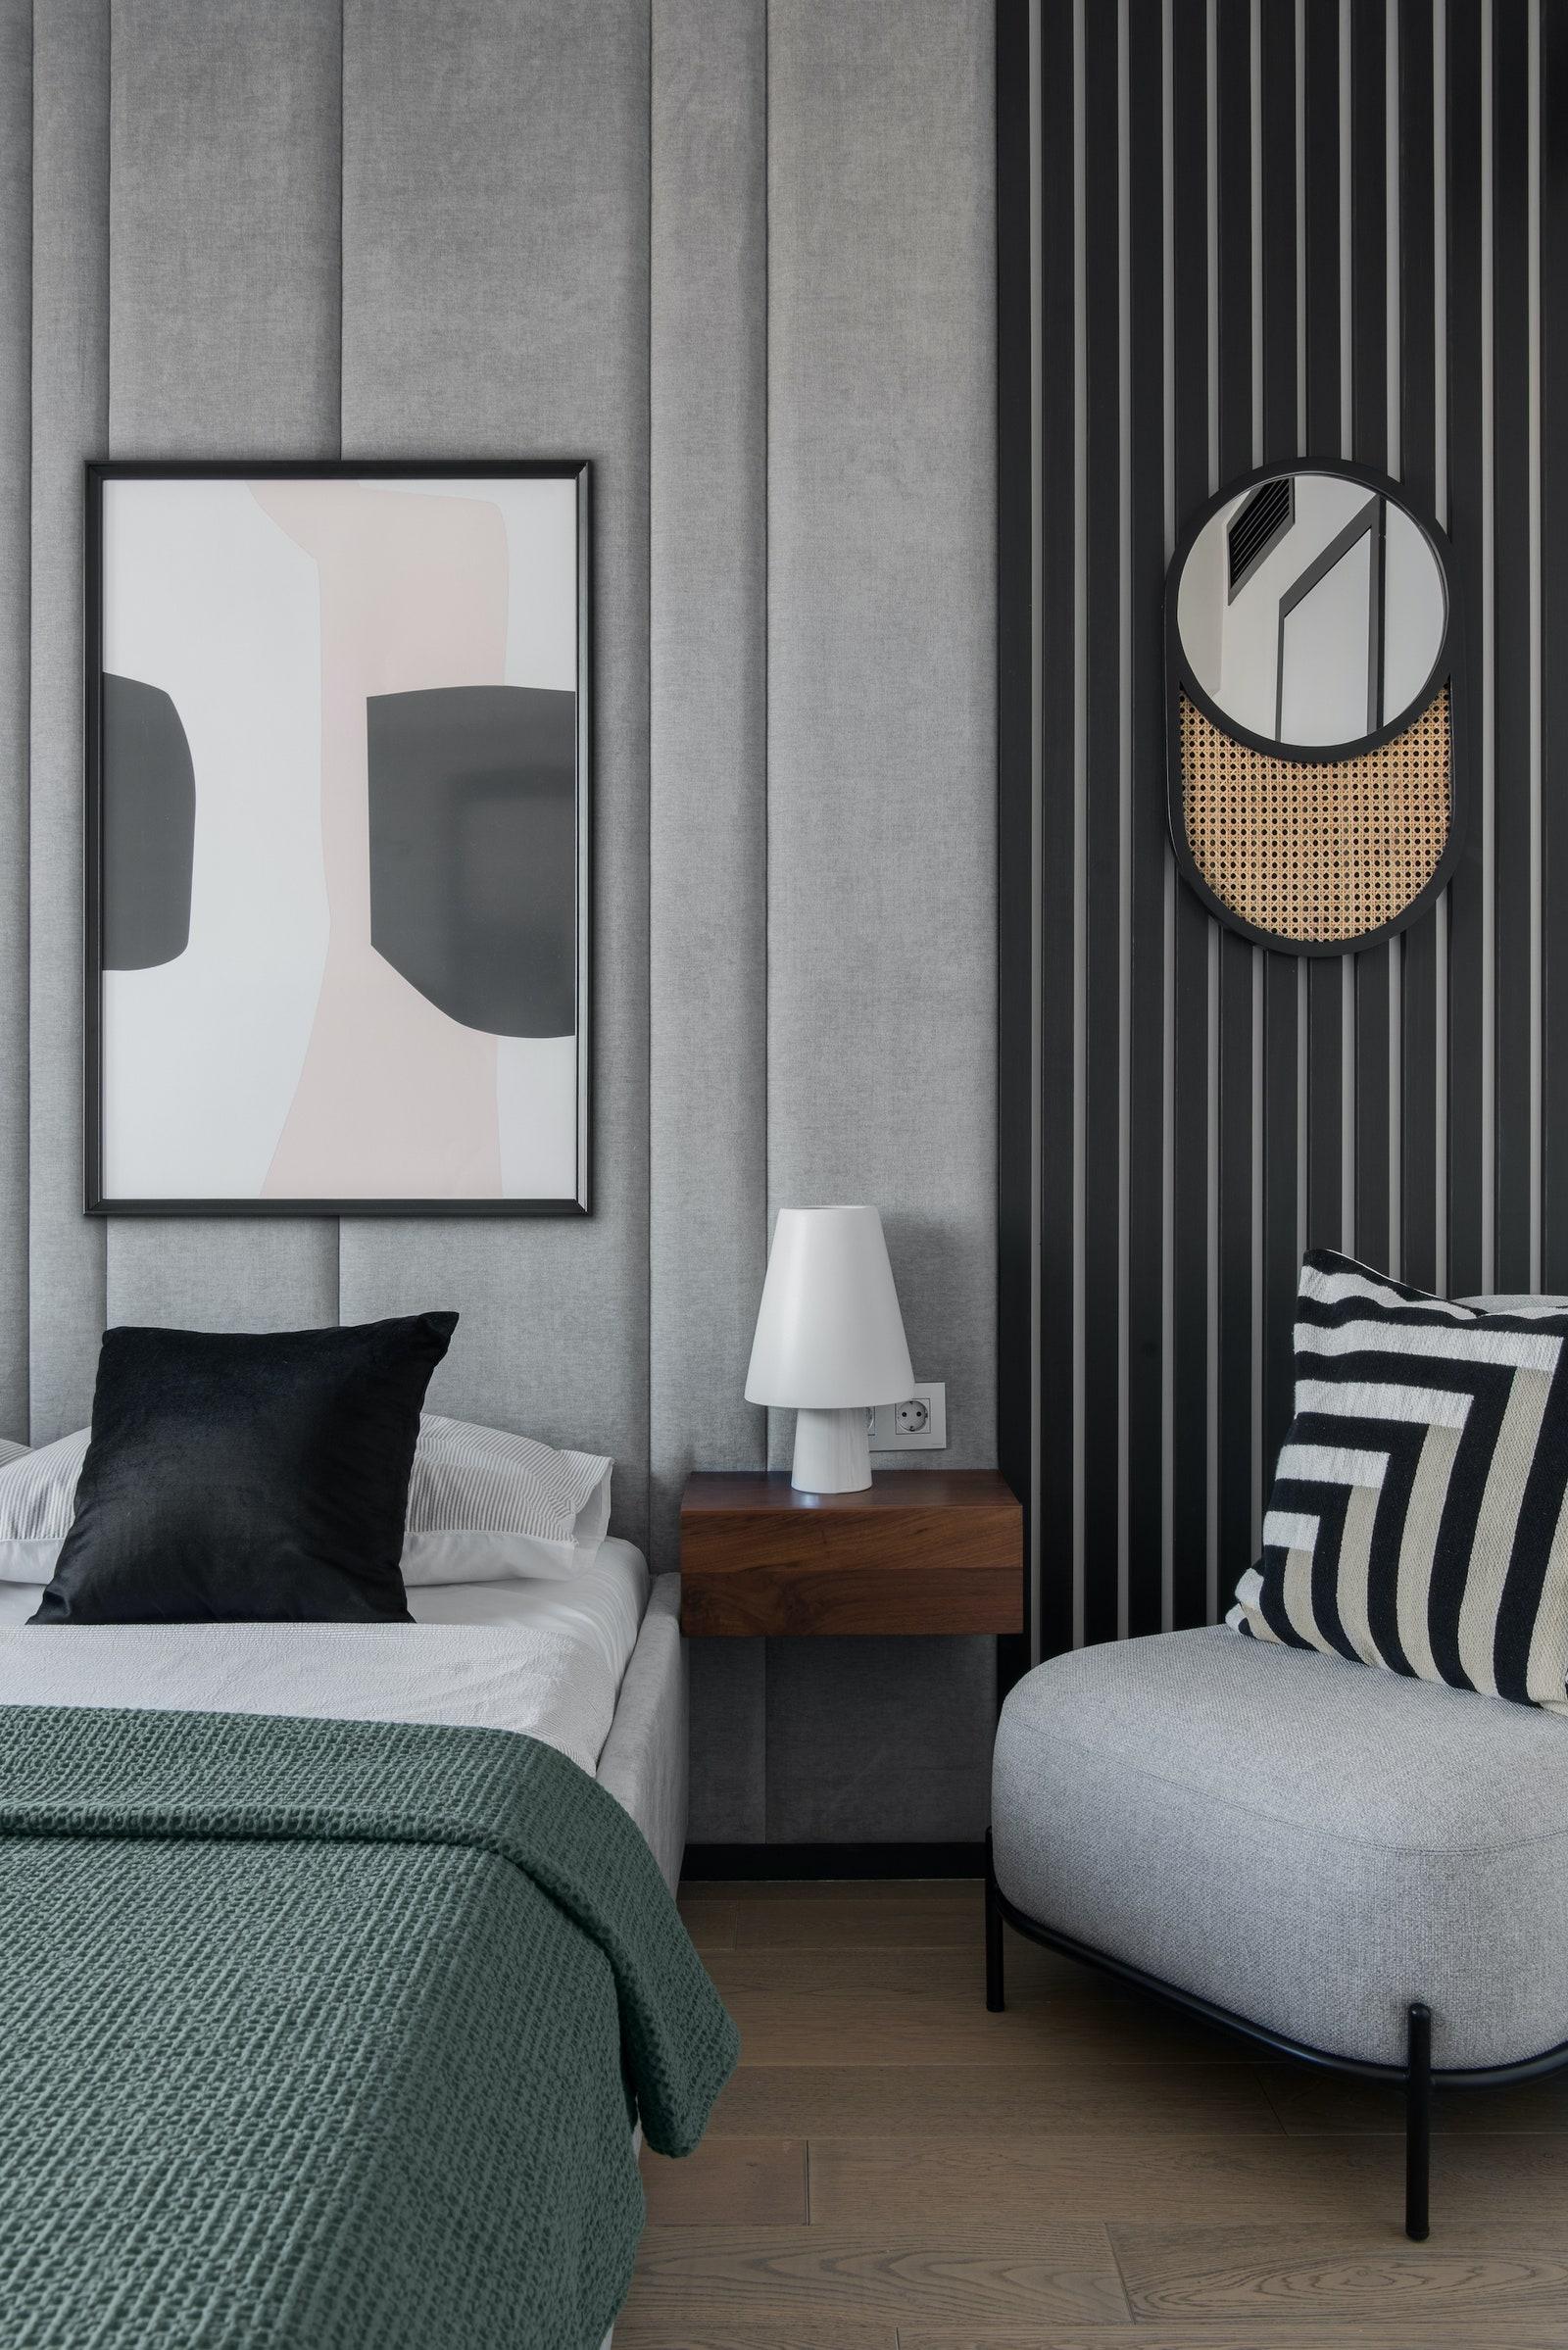 .     La Redoute  Pawai Cosmo     wallhome    HampM Home.      Etsy  IKEA.